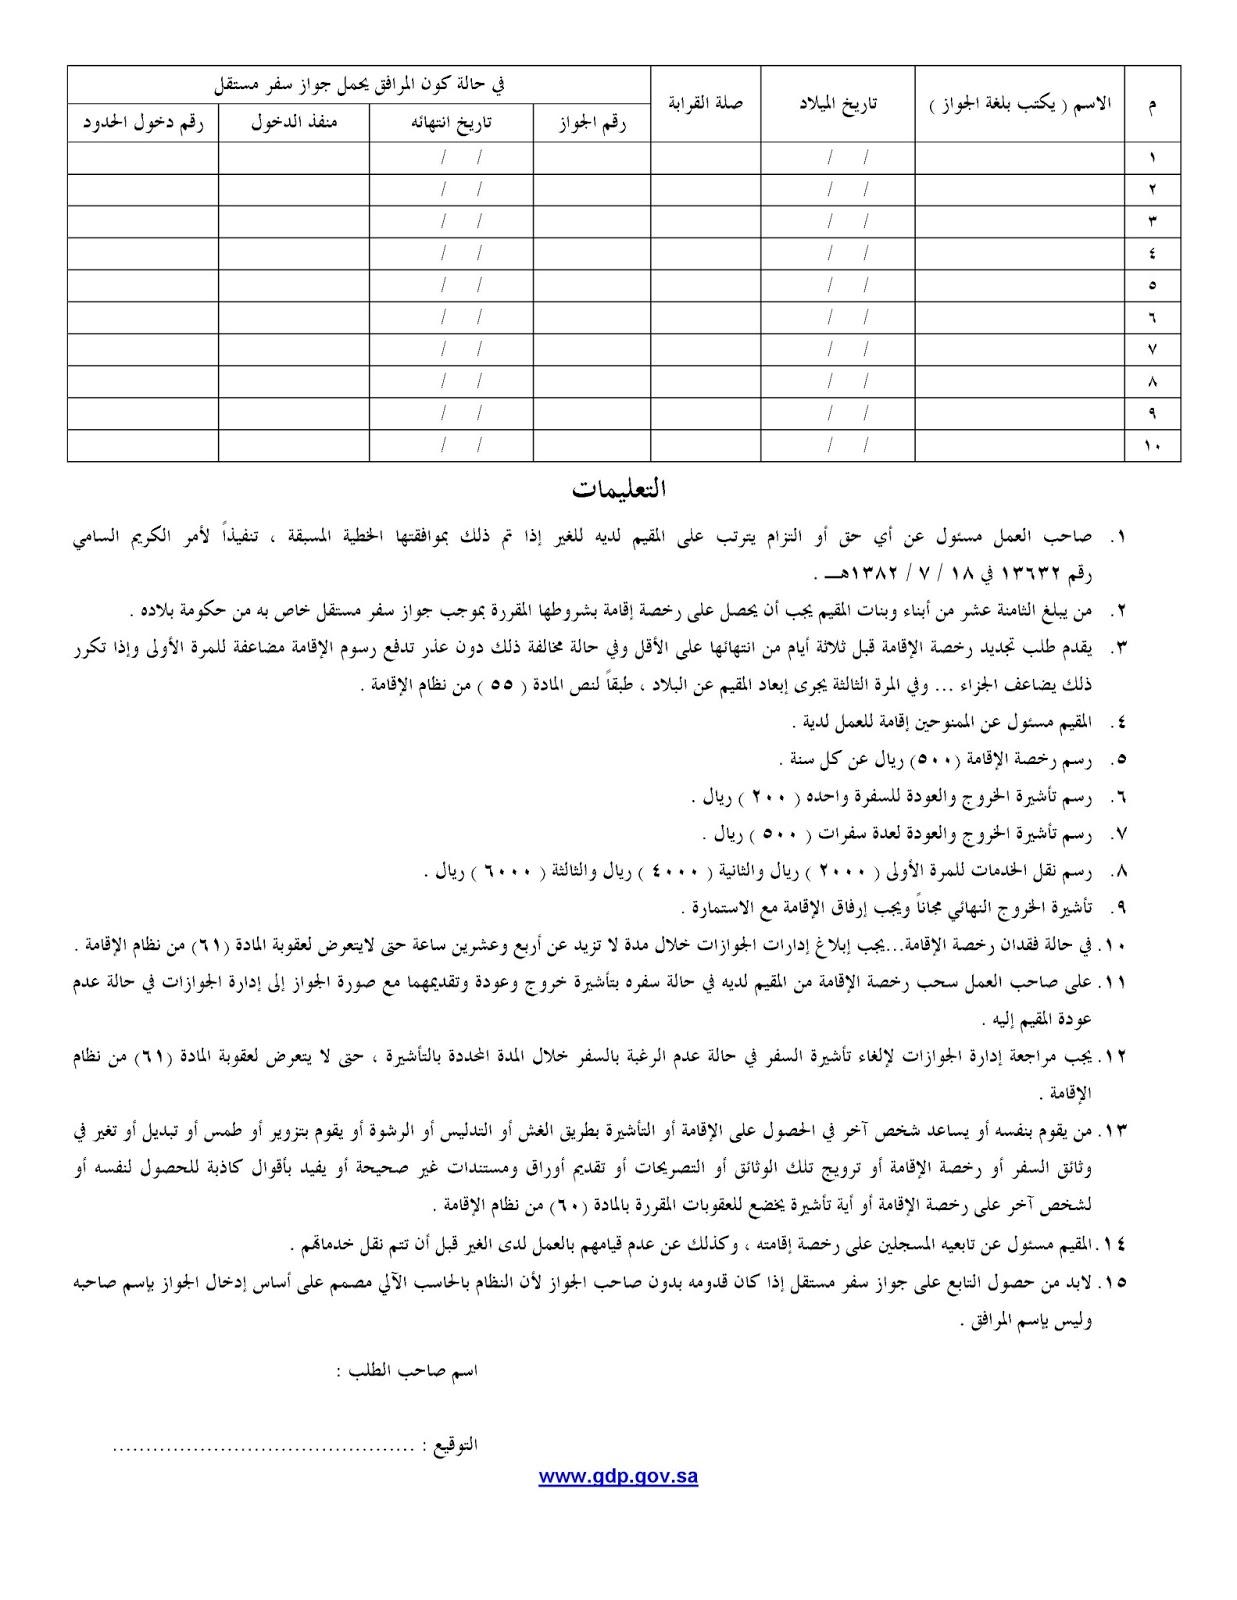 Iqama Form: How to Apply for Family Iqama or Permanent Family Visa in Saudi Arabia